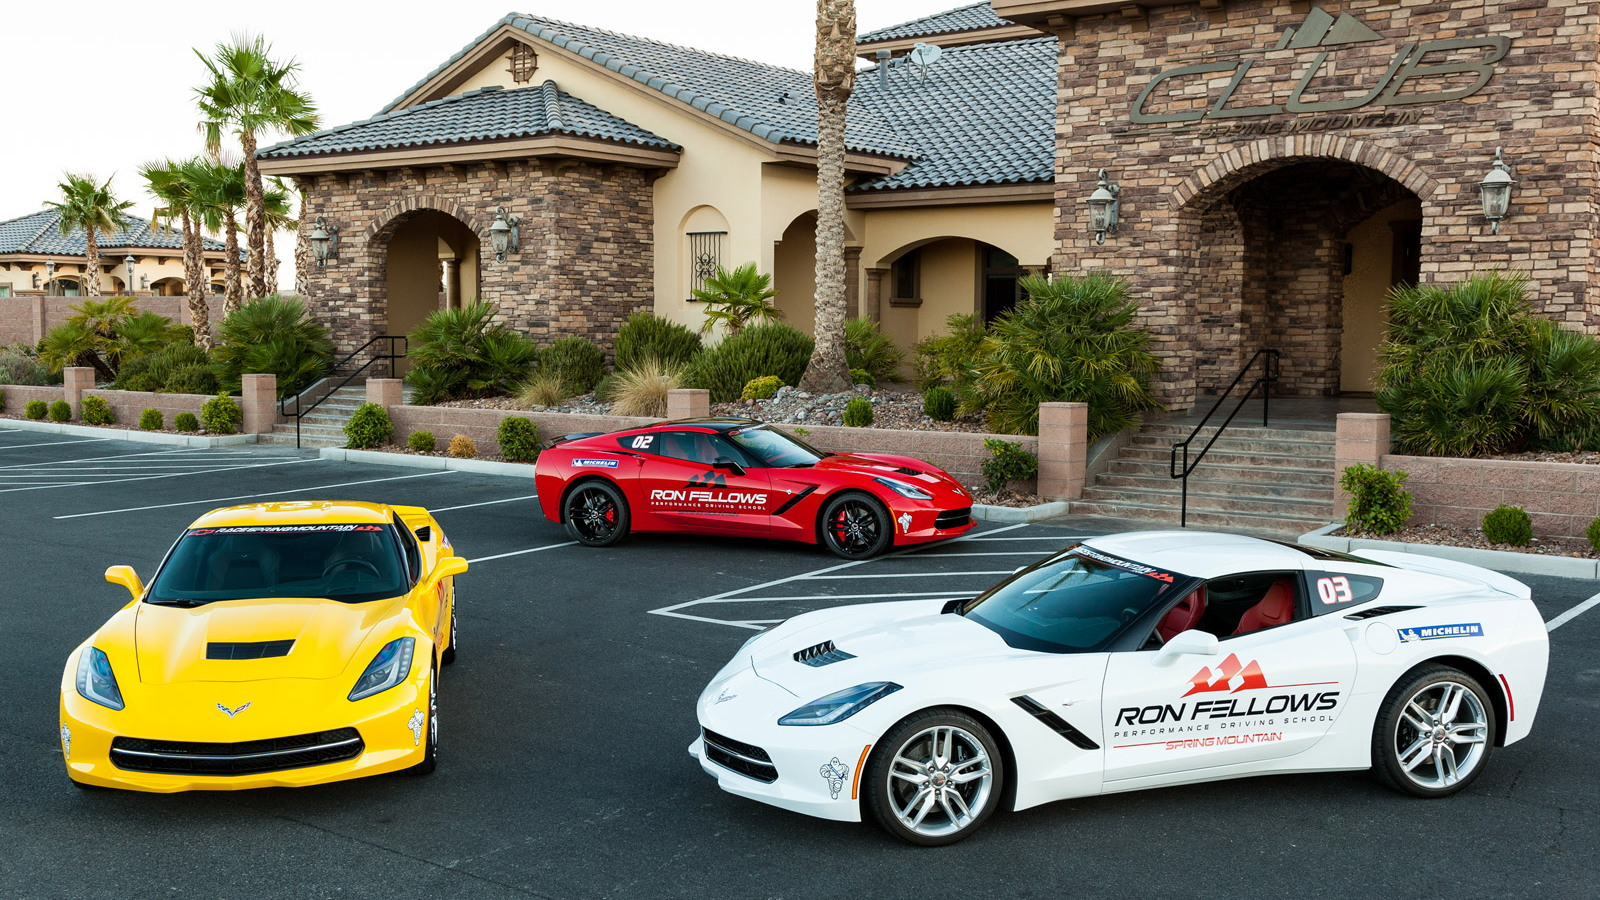 2014 Chevrolet Corvette Stingray at Ron Fellows Performance Driving School